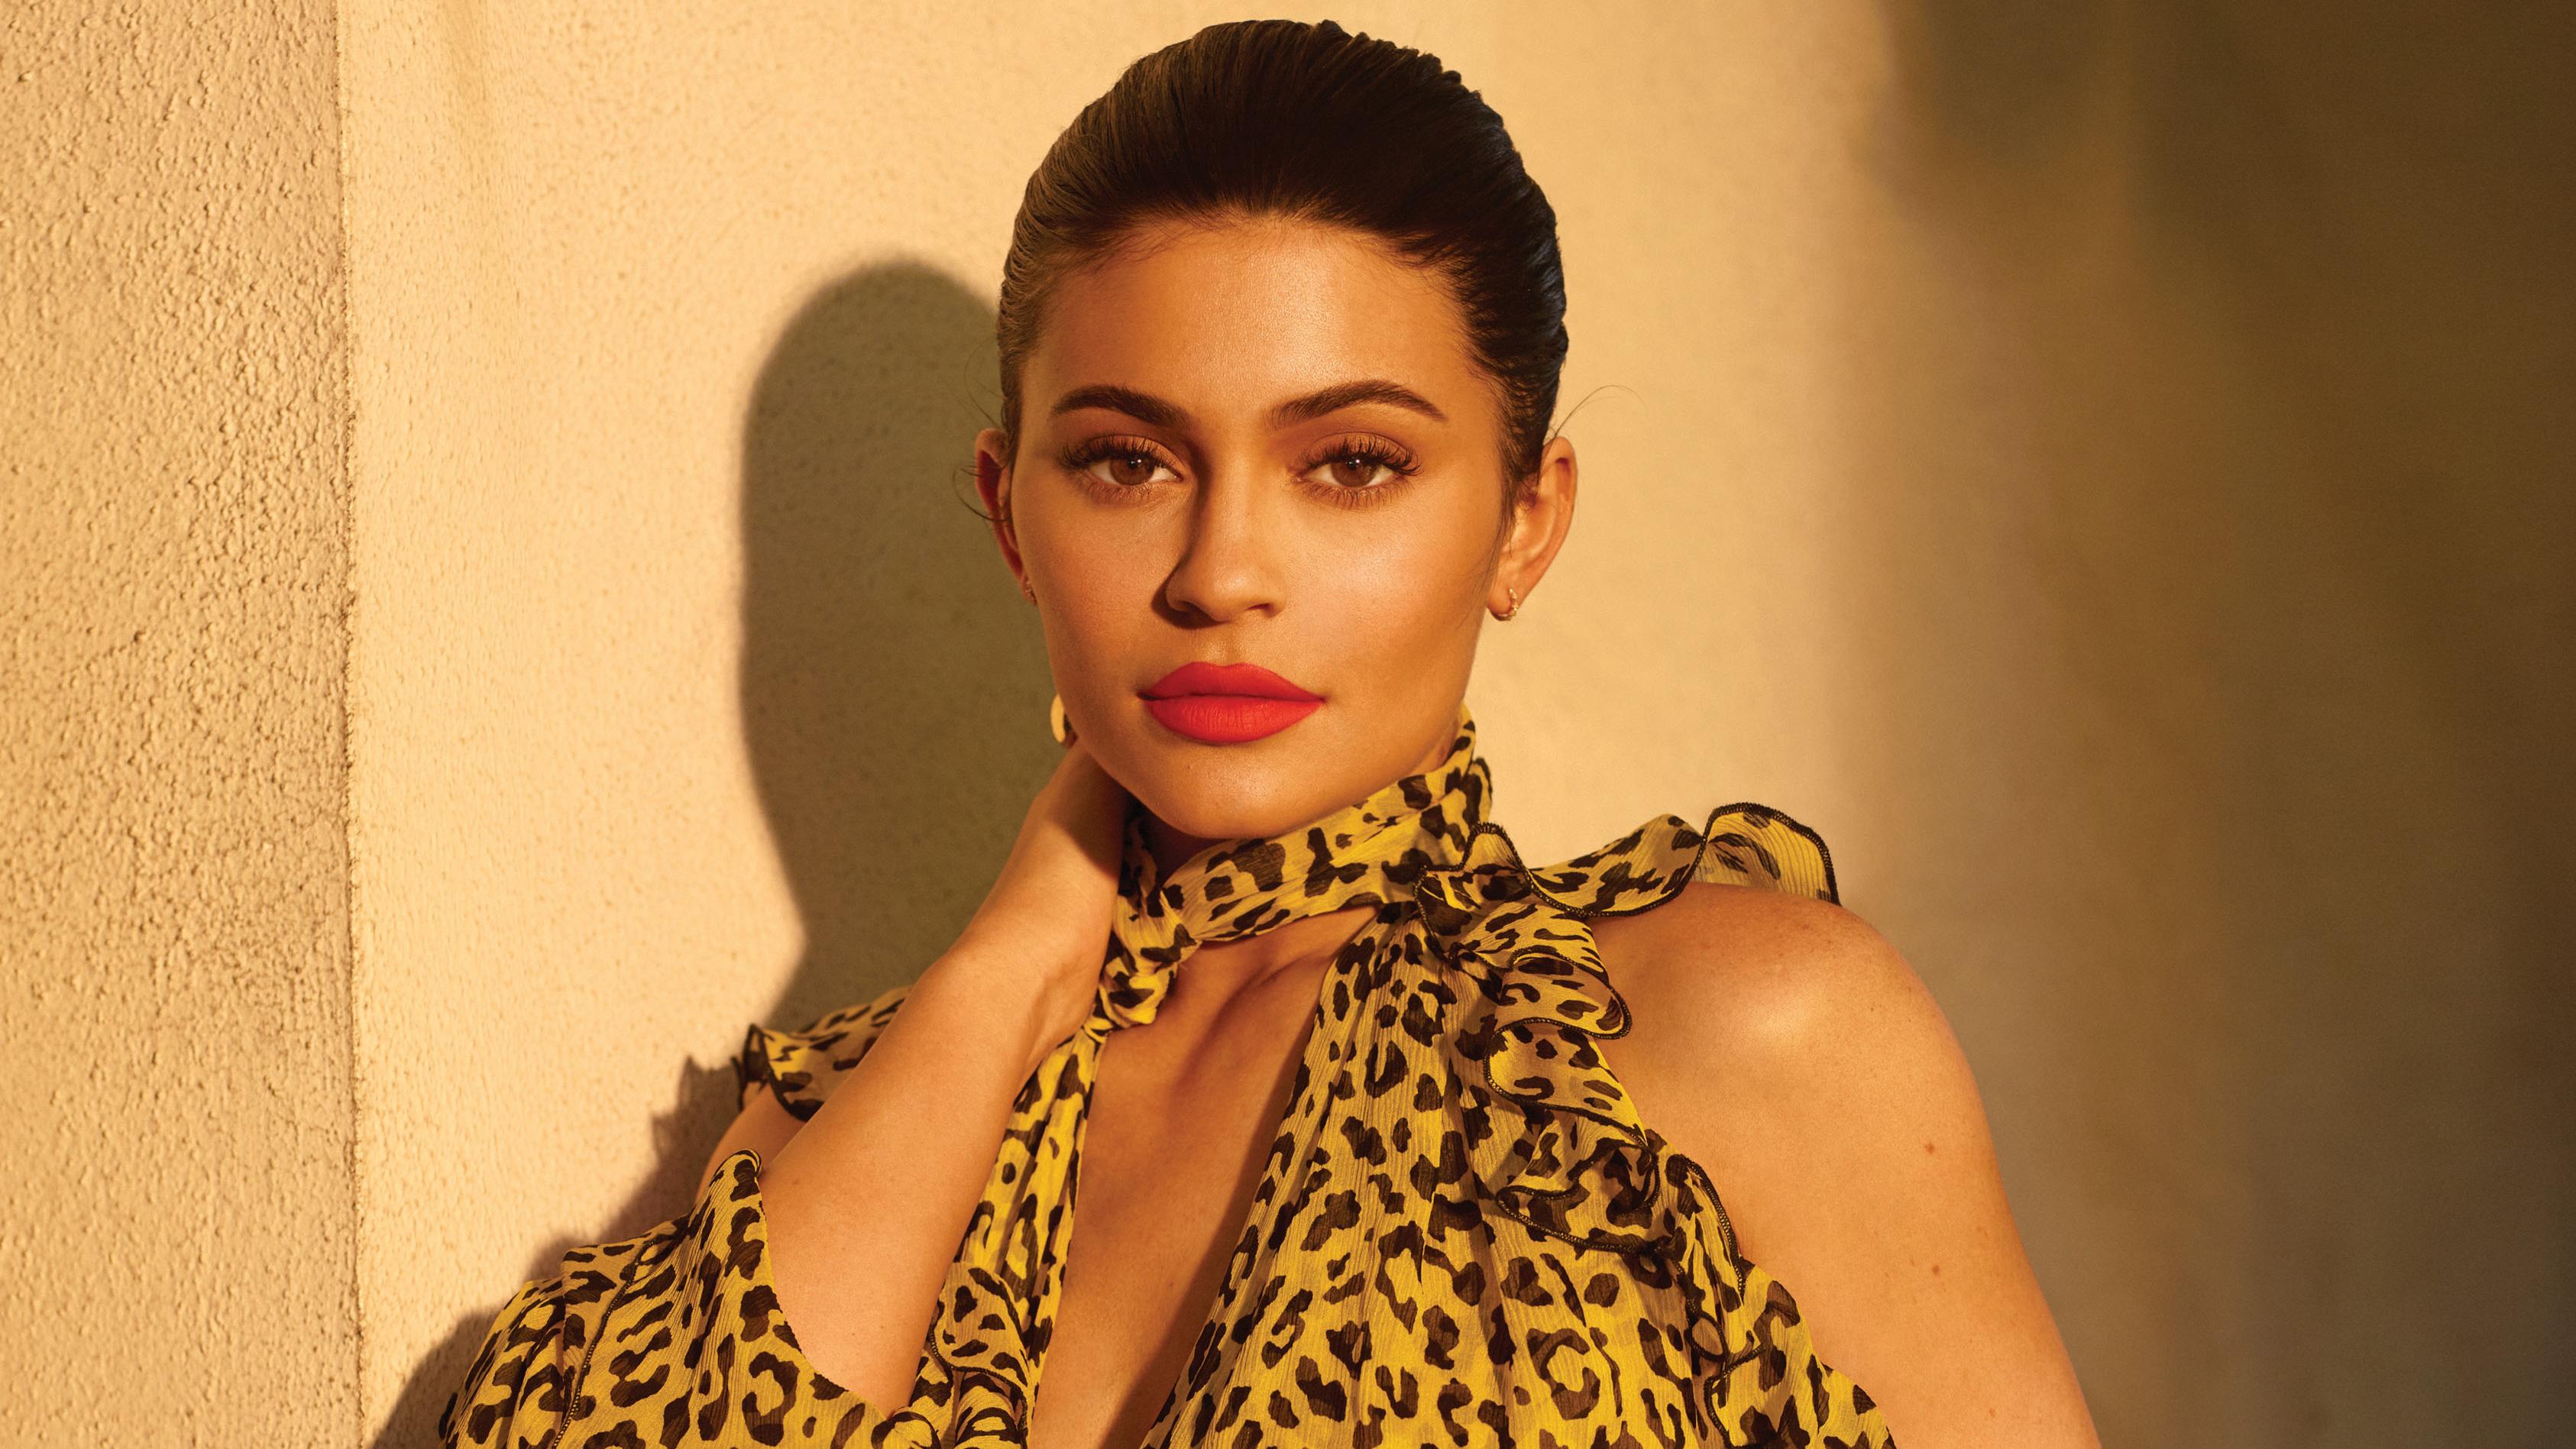 Kylie Jenner Glamour Photoshoot 2018, HD Celebrities, 4k ...